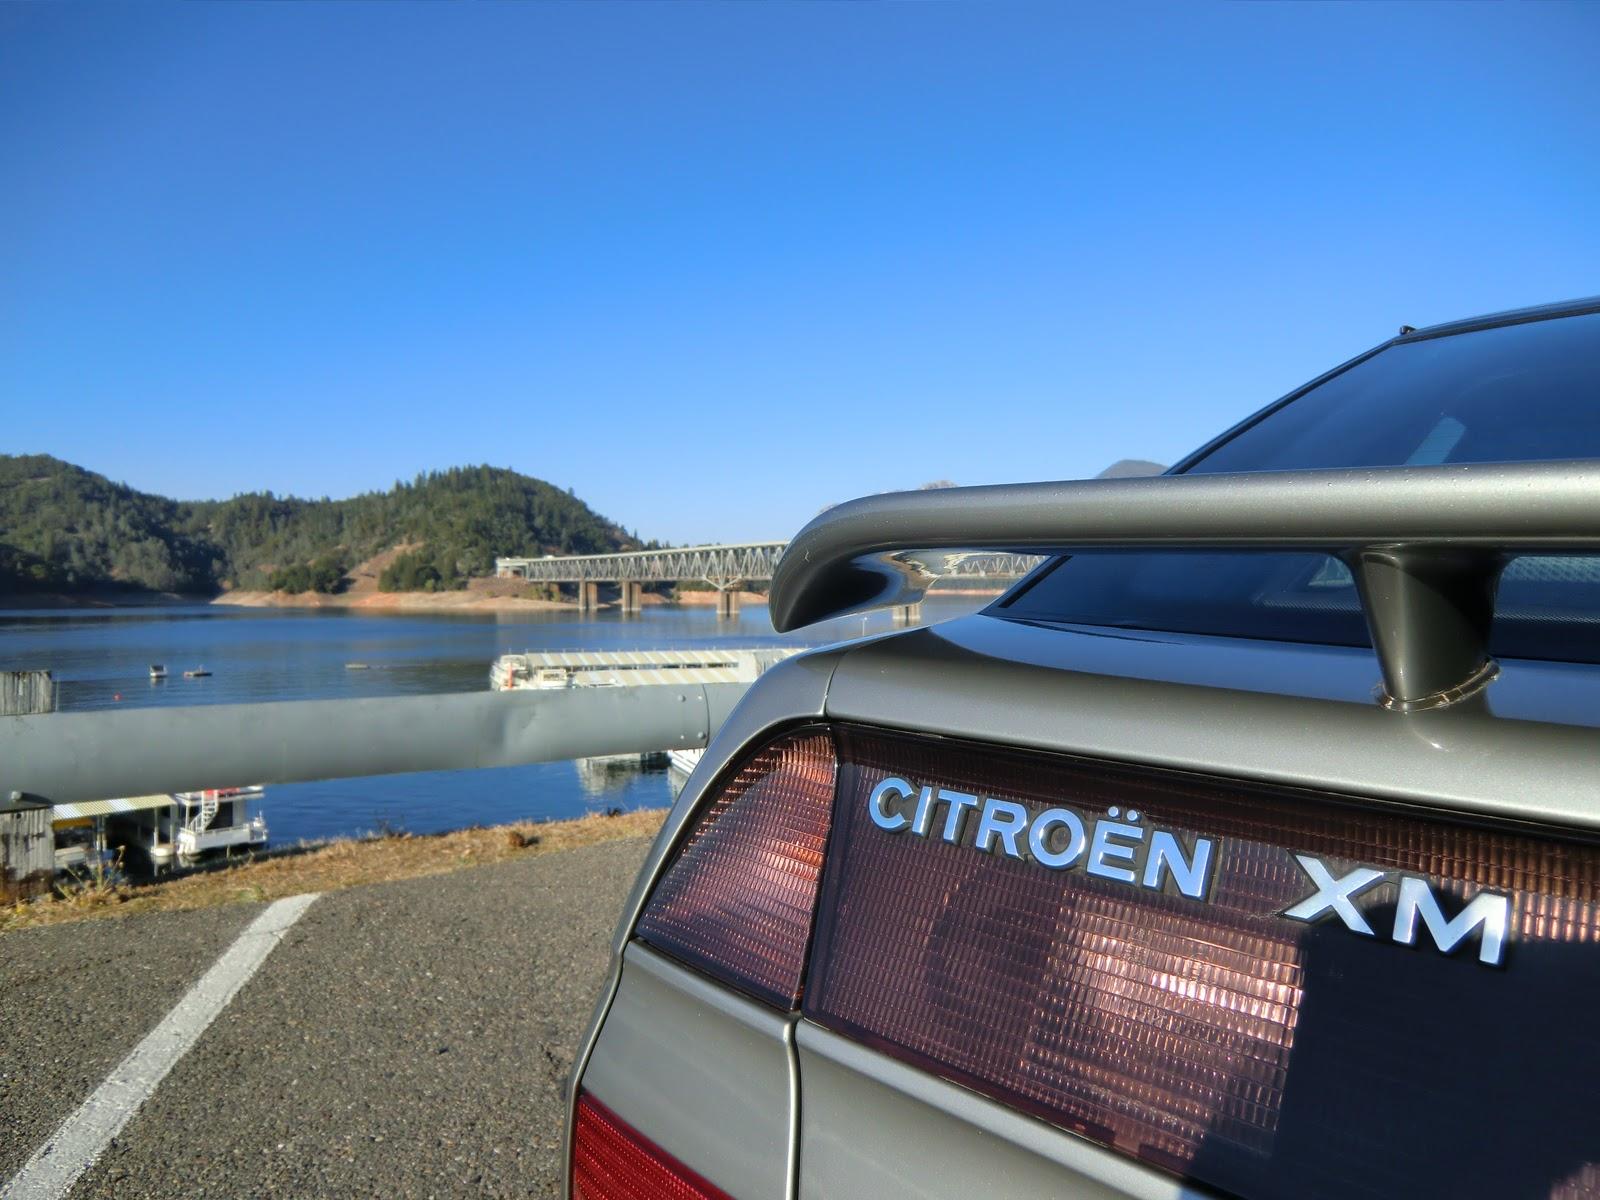 Portland Car Dealerships >> Tamerlane's Thoughts: Road trip in a Citroen XM